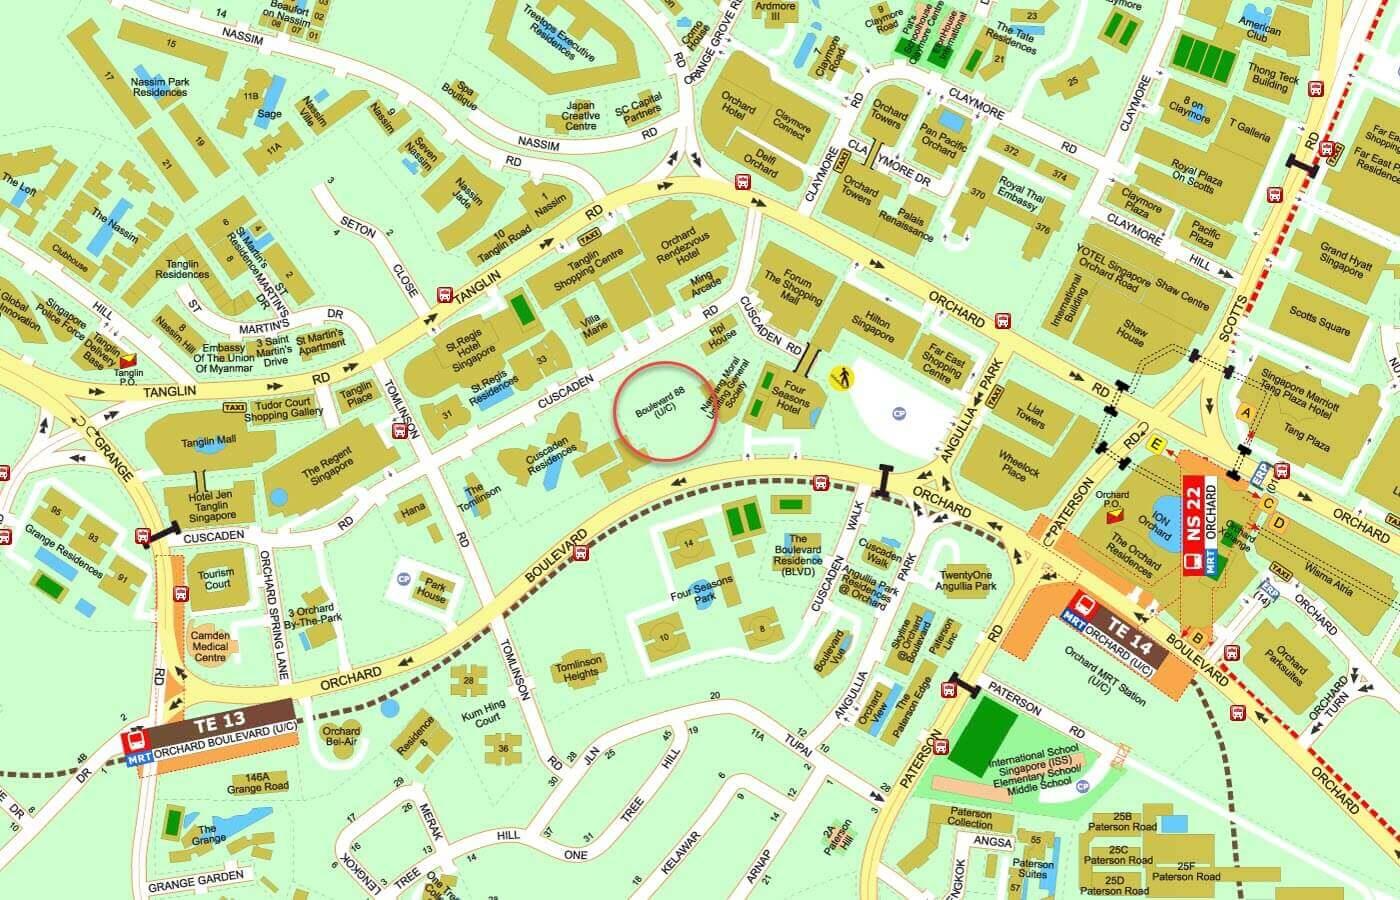 Boulevard 88 Condo Street Directory Map